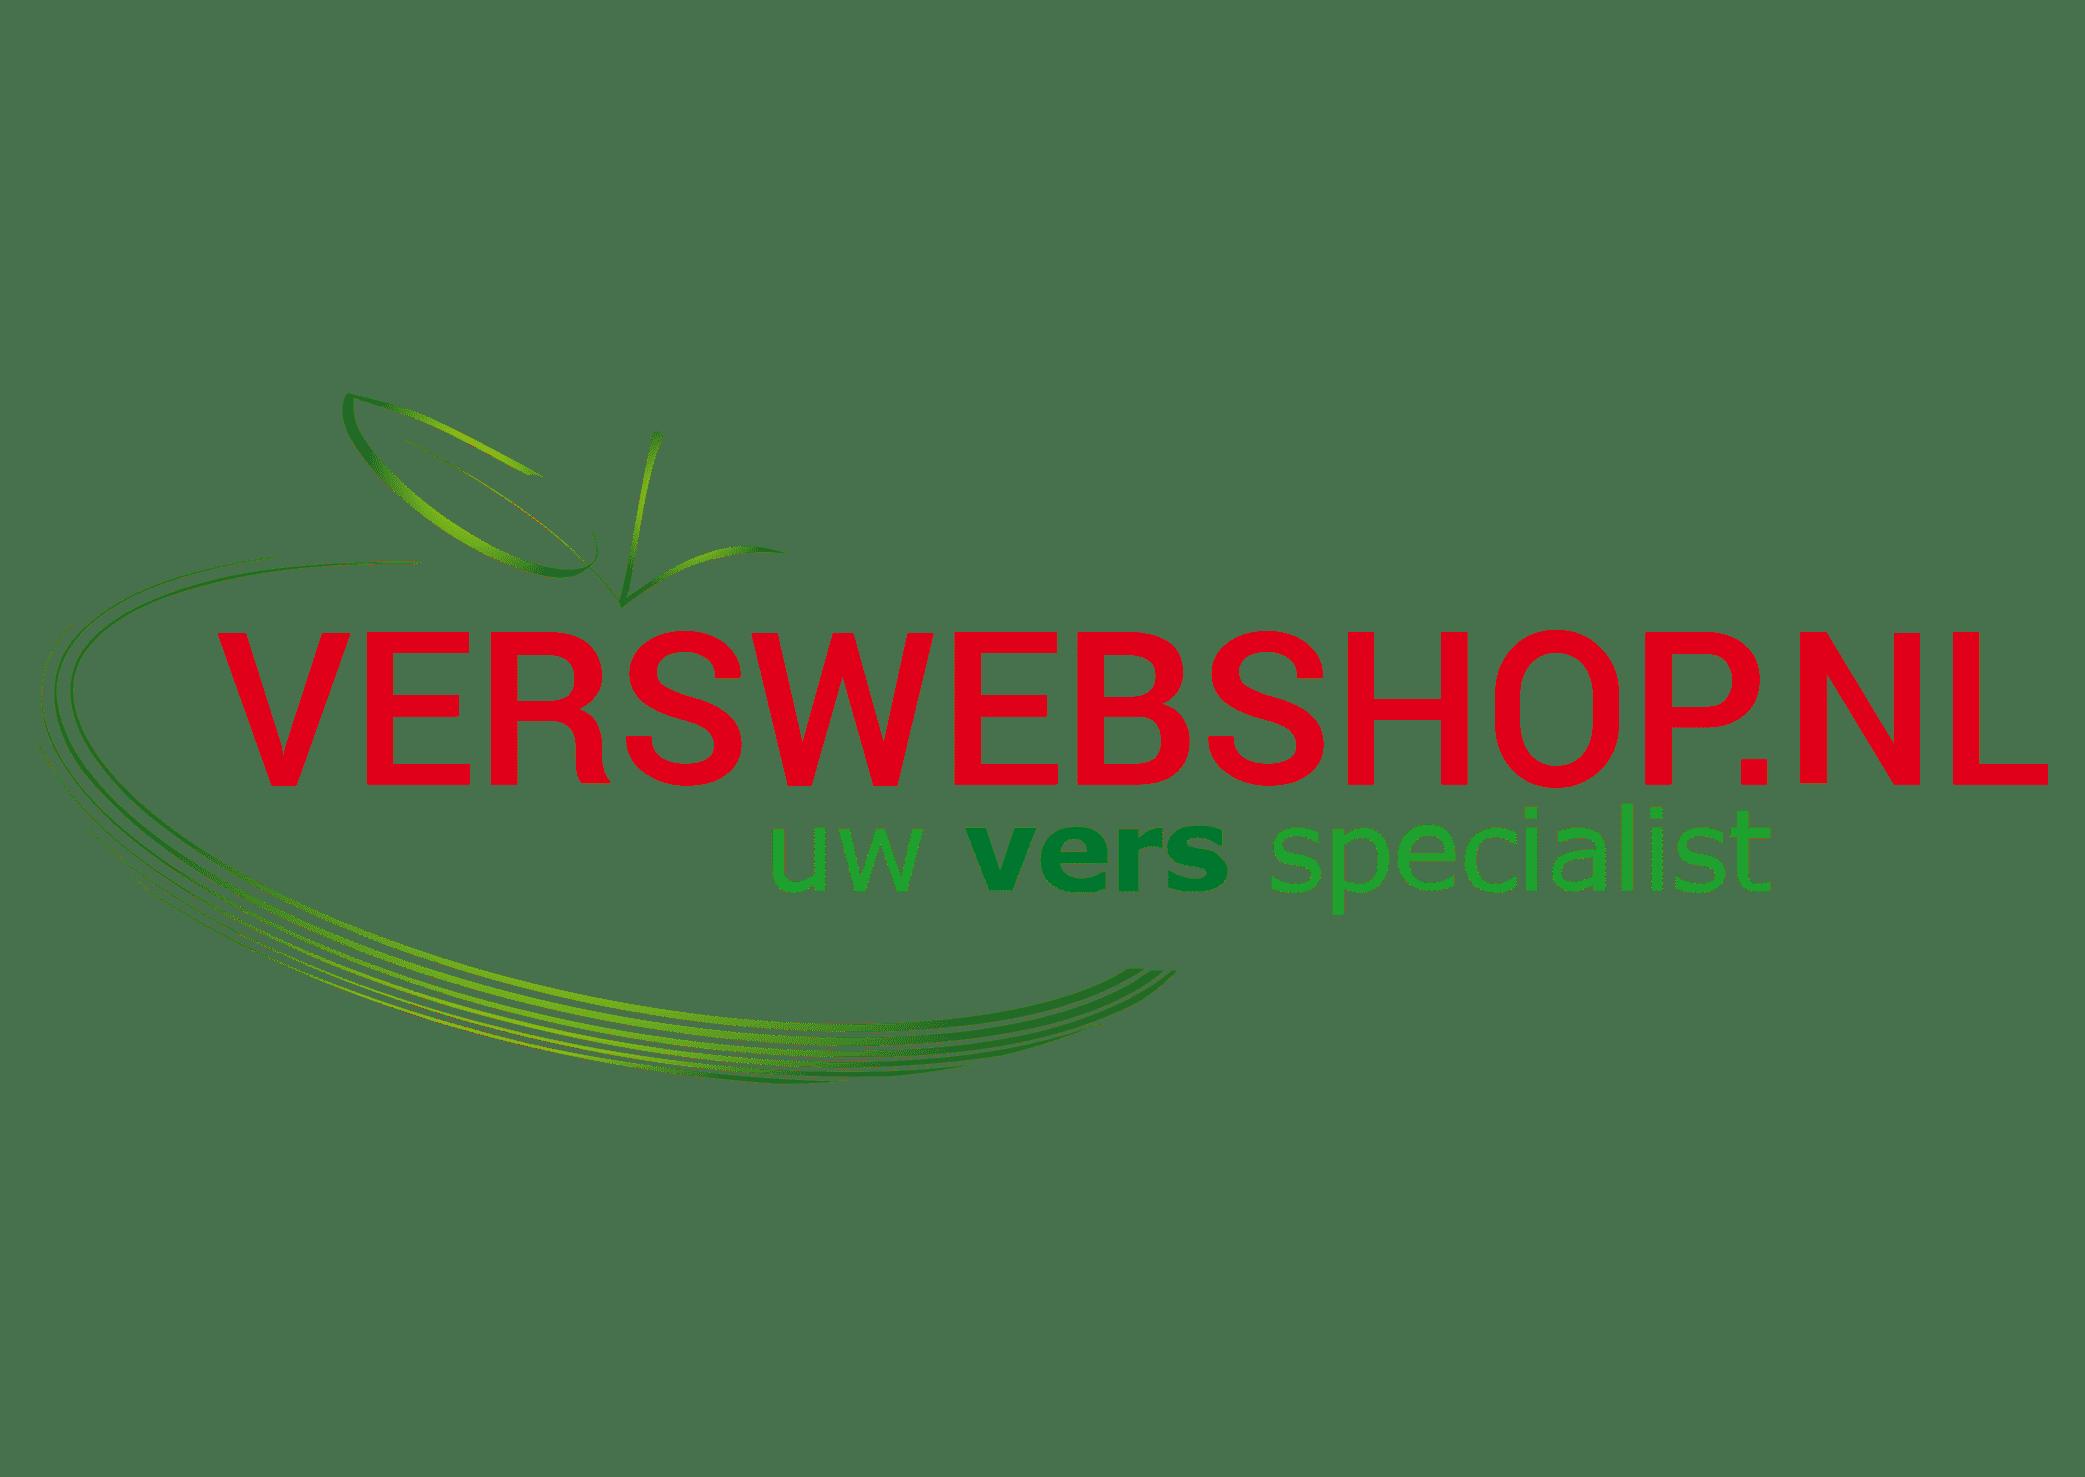 Verswebshop